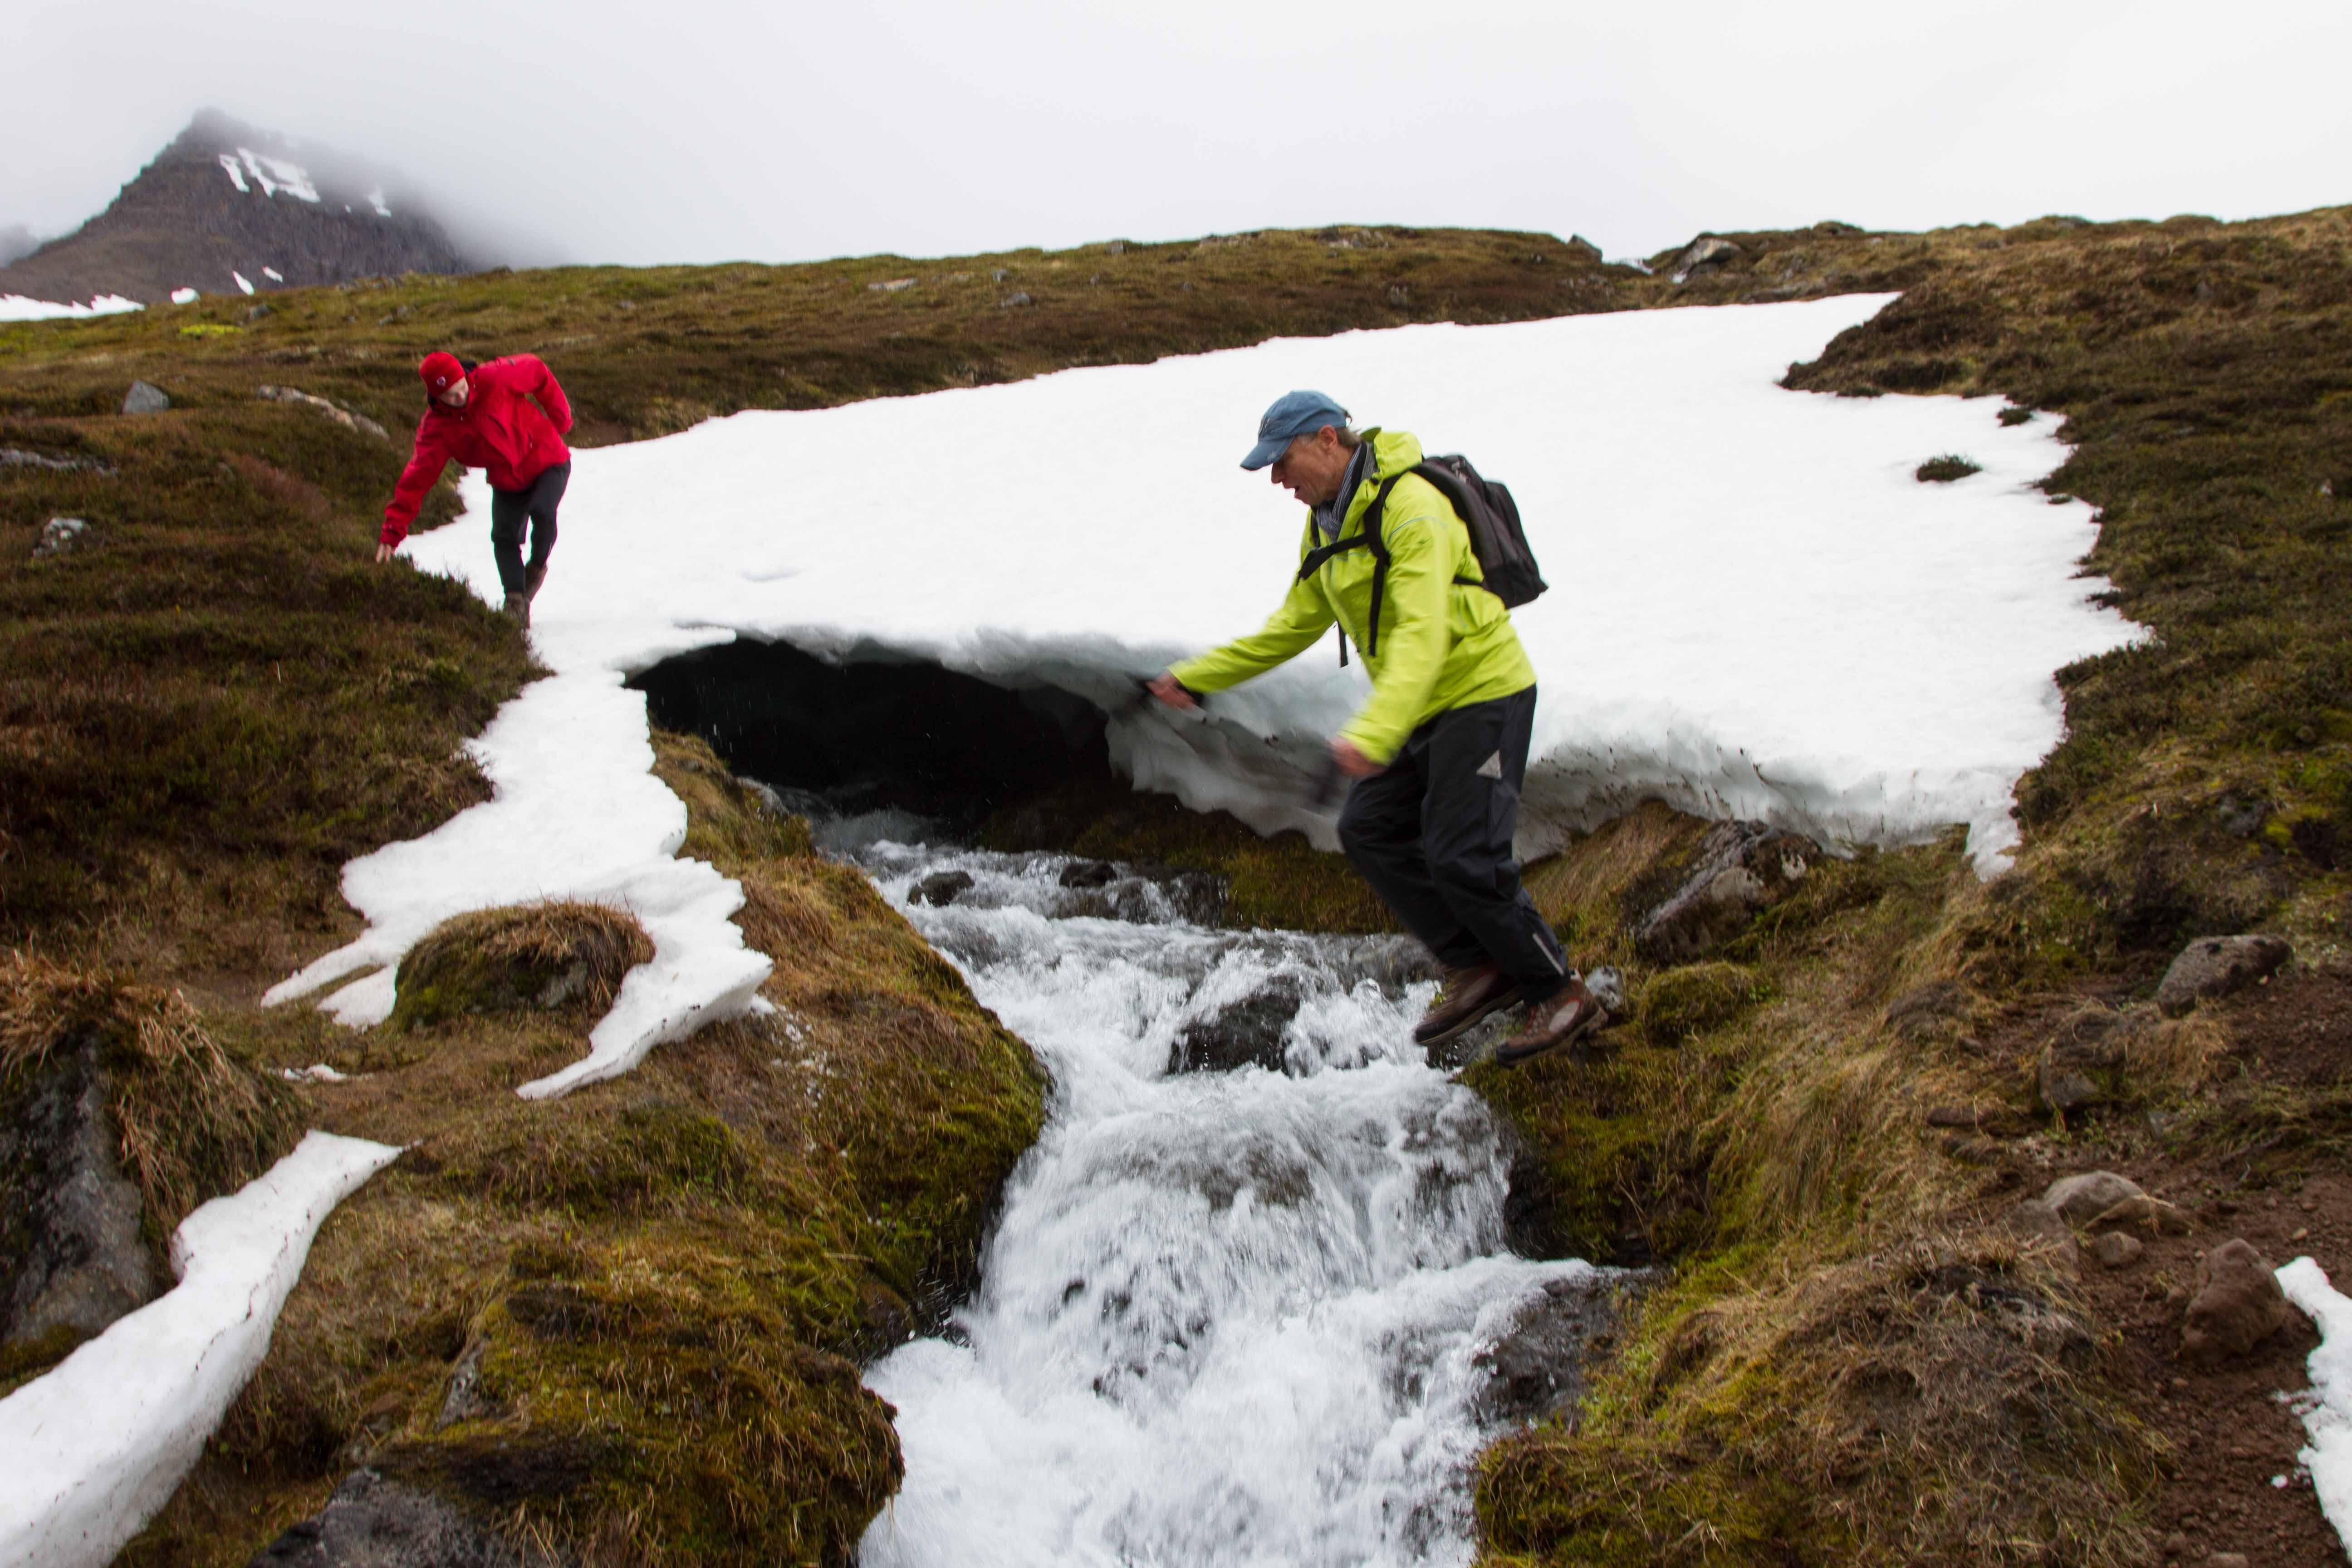 Gletscherbachquerung